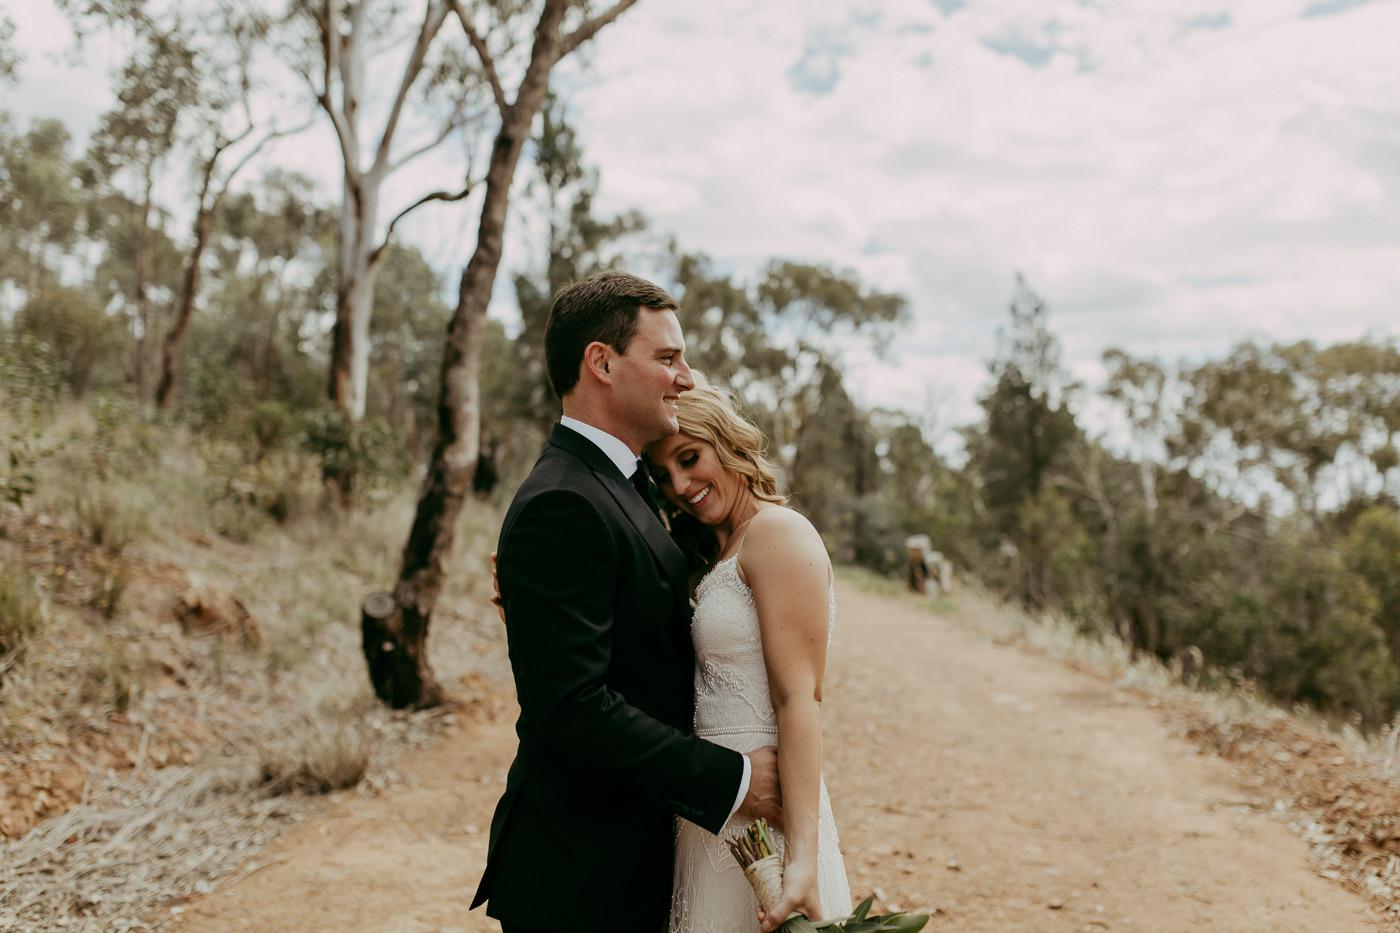 Anthony & Eliet - Wagga Wagga Wedding - Country NSW - Samantha Heather Photography-54.jpg